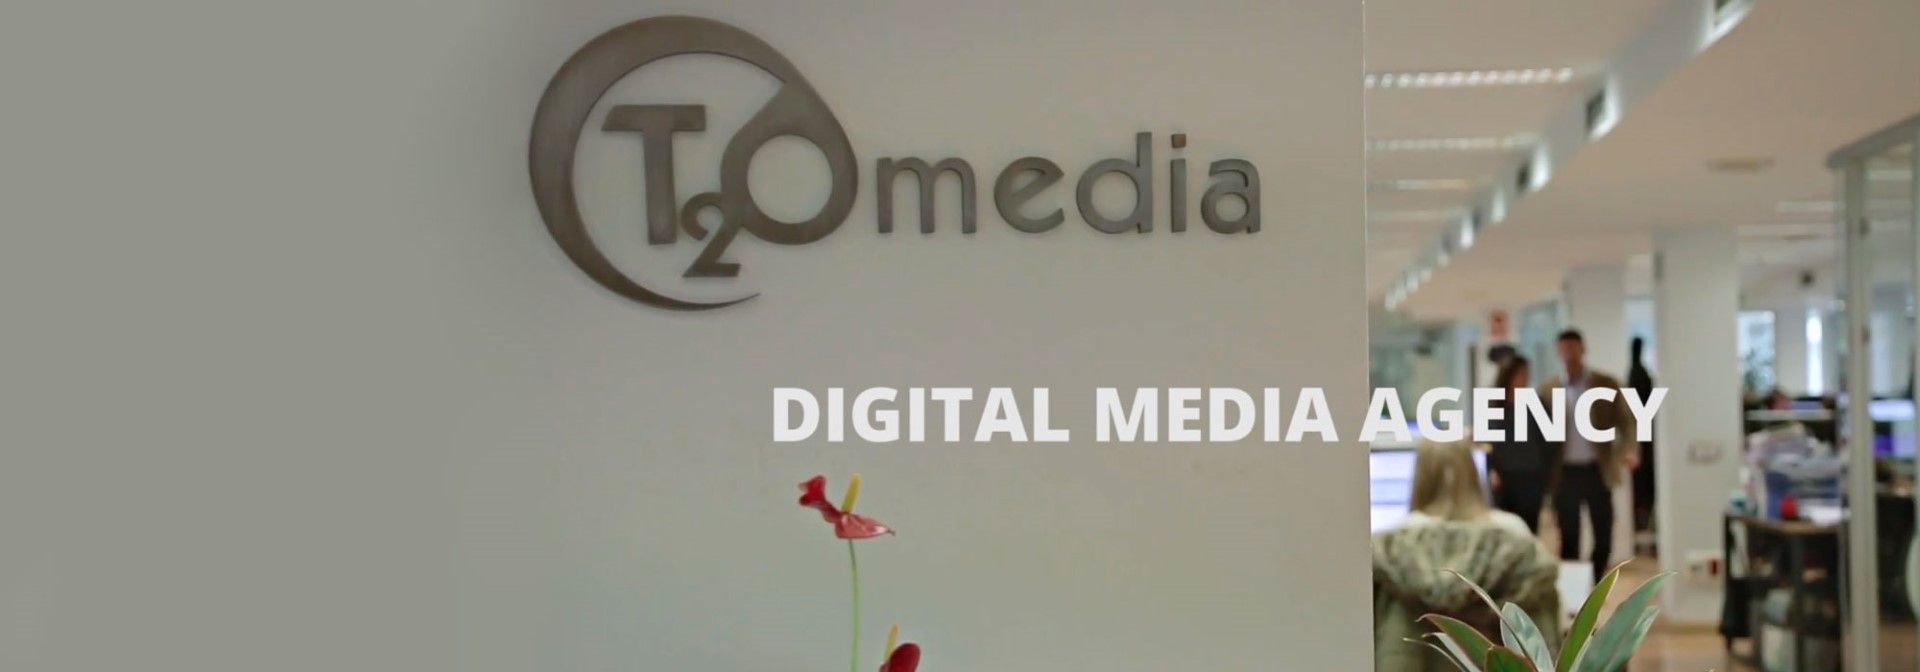 T2O media USA